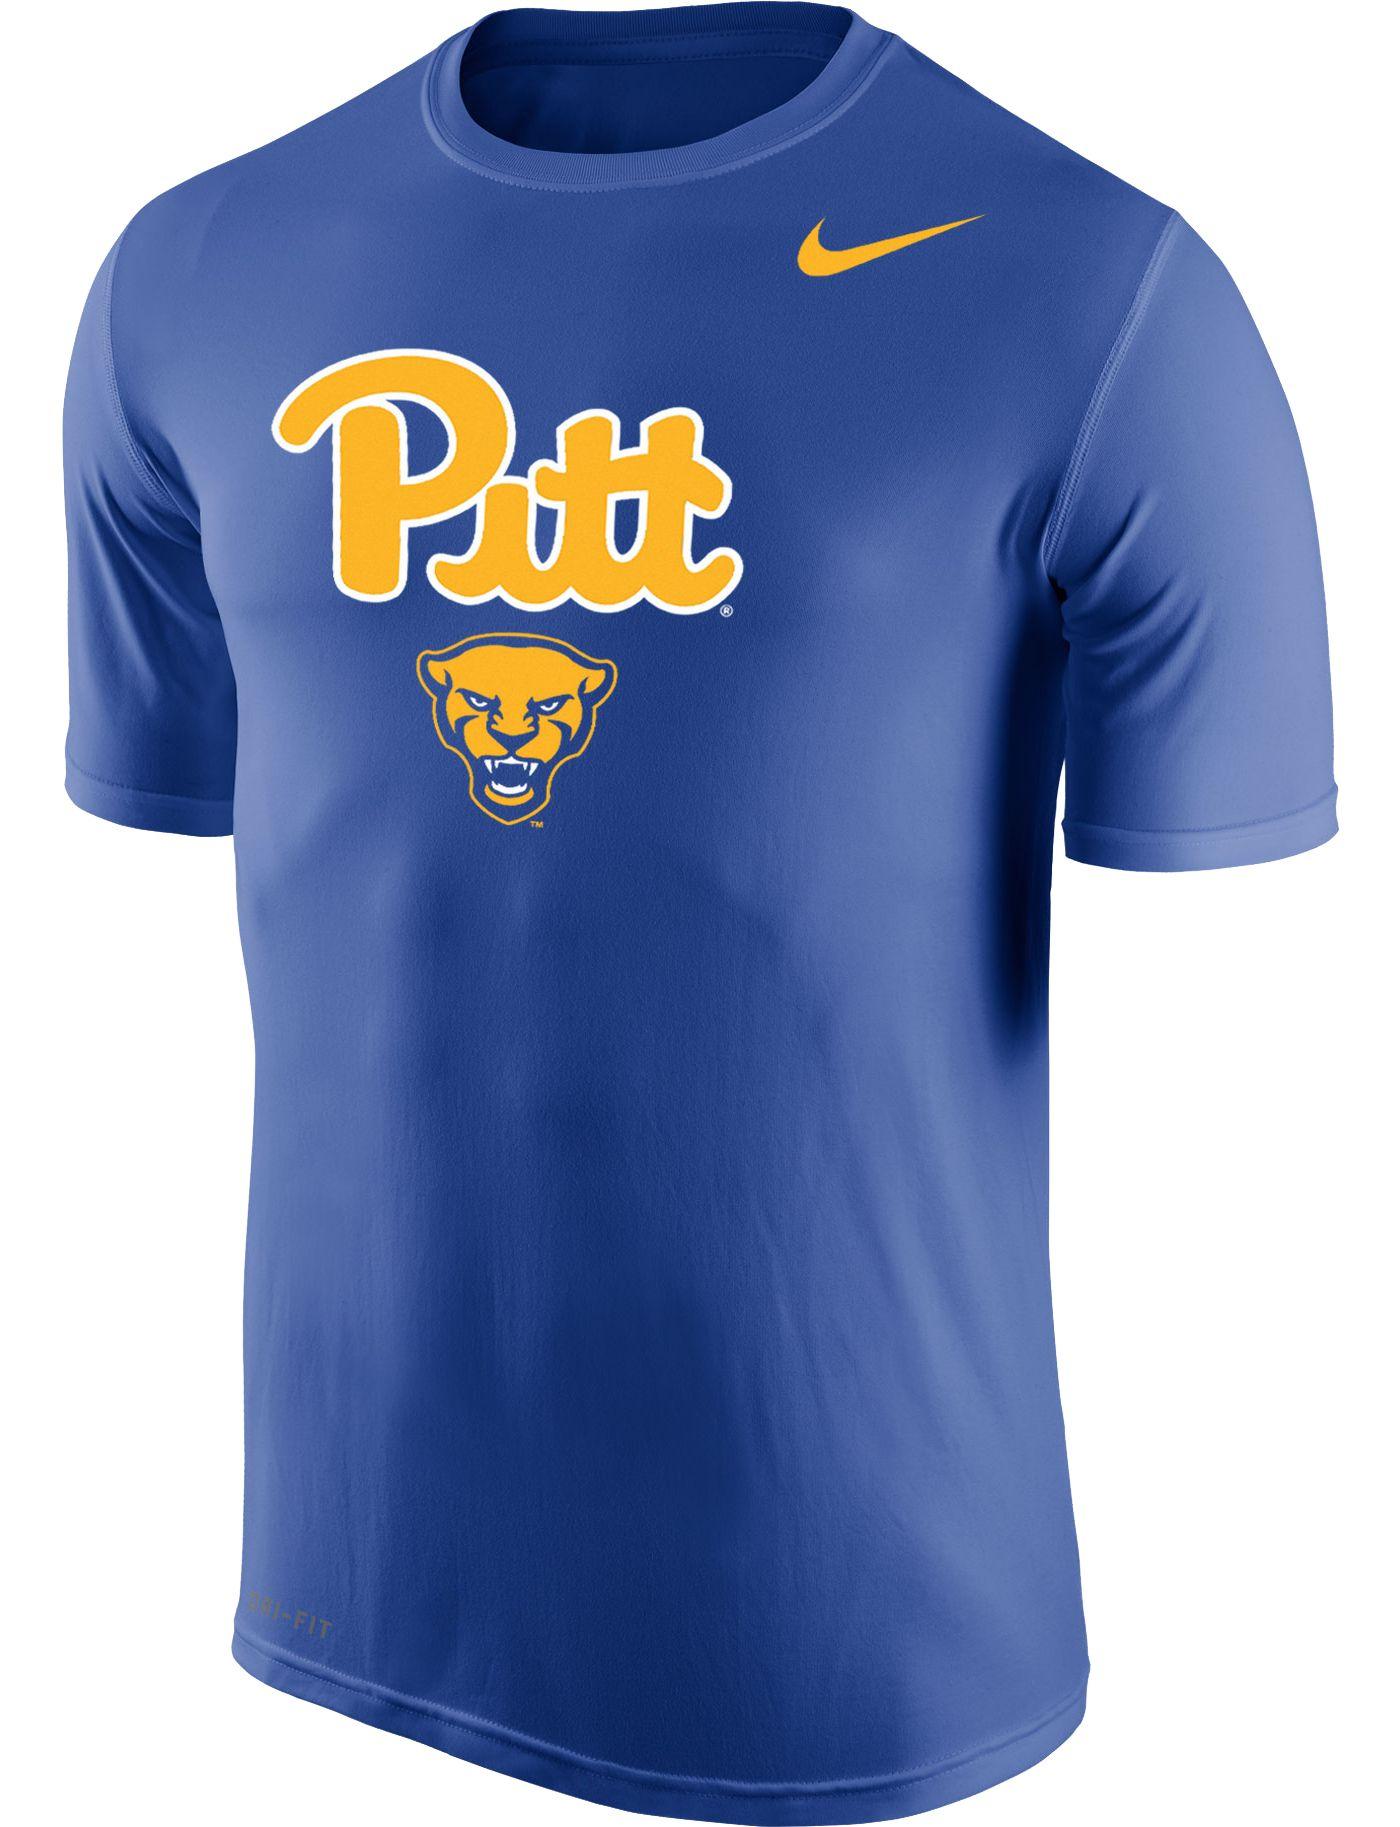 Nike Men's Pitt Panthers Blue Dri-FIT Legend 2.0 T-Shirt